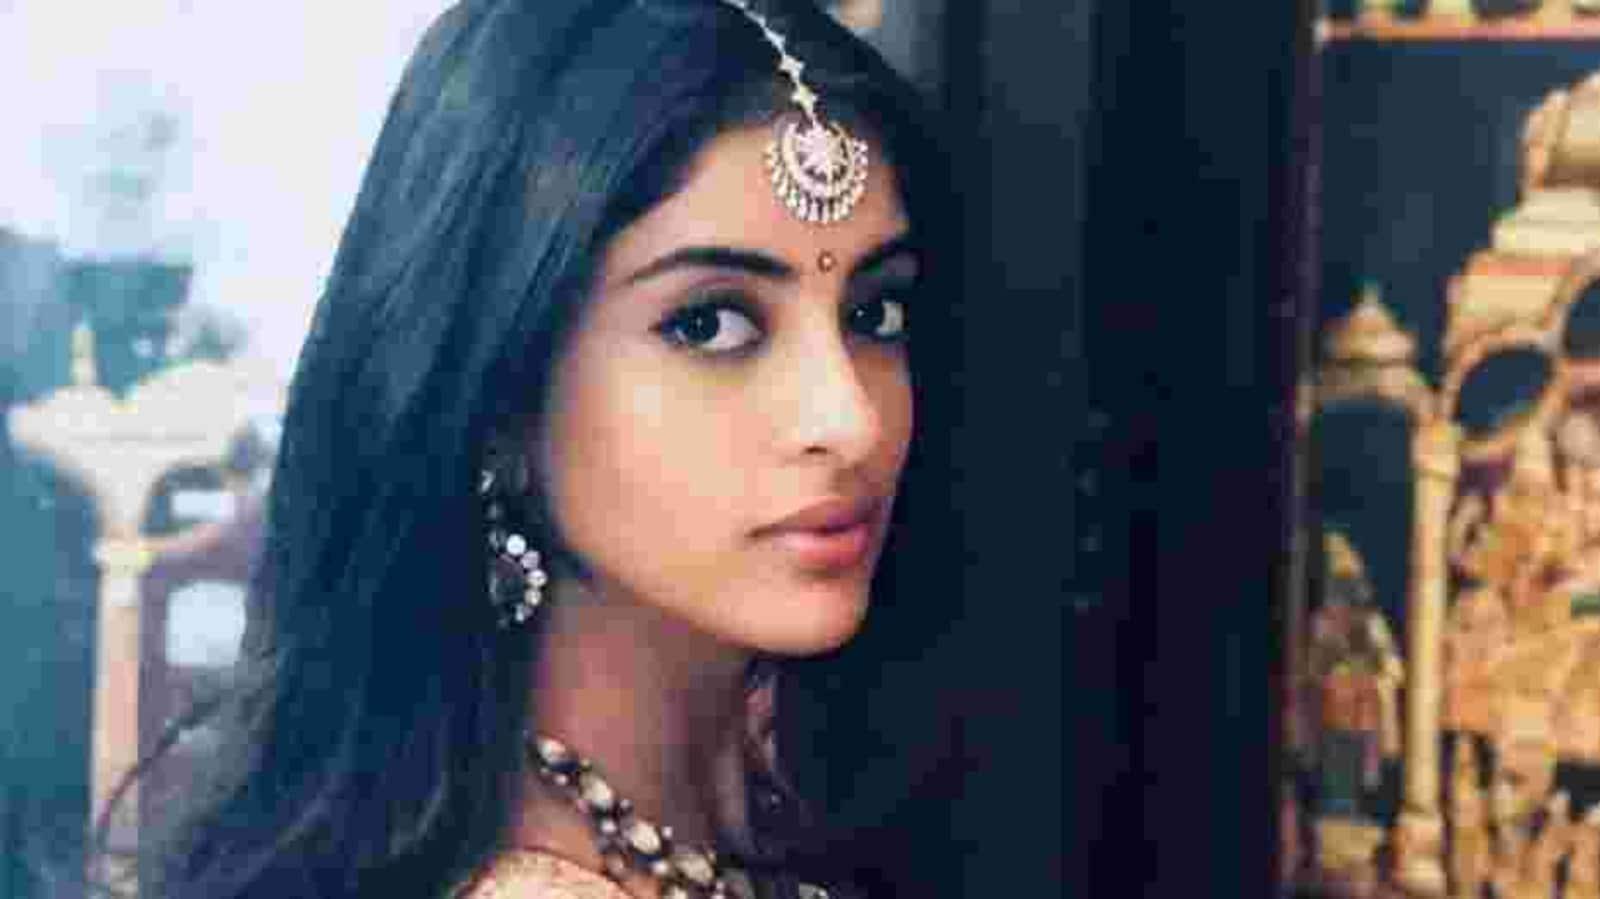 Amitabh Bachchan's granddaughter Navya Naveli Nanda disturbed as SC asks rape accused if he will marry survivor - Hindustan Times